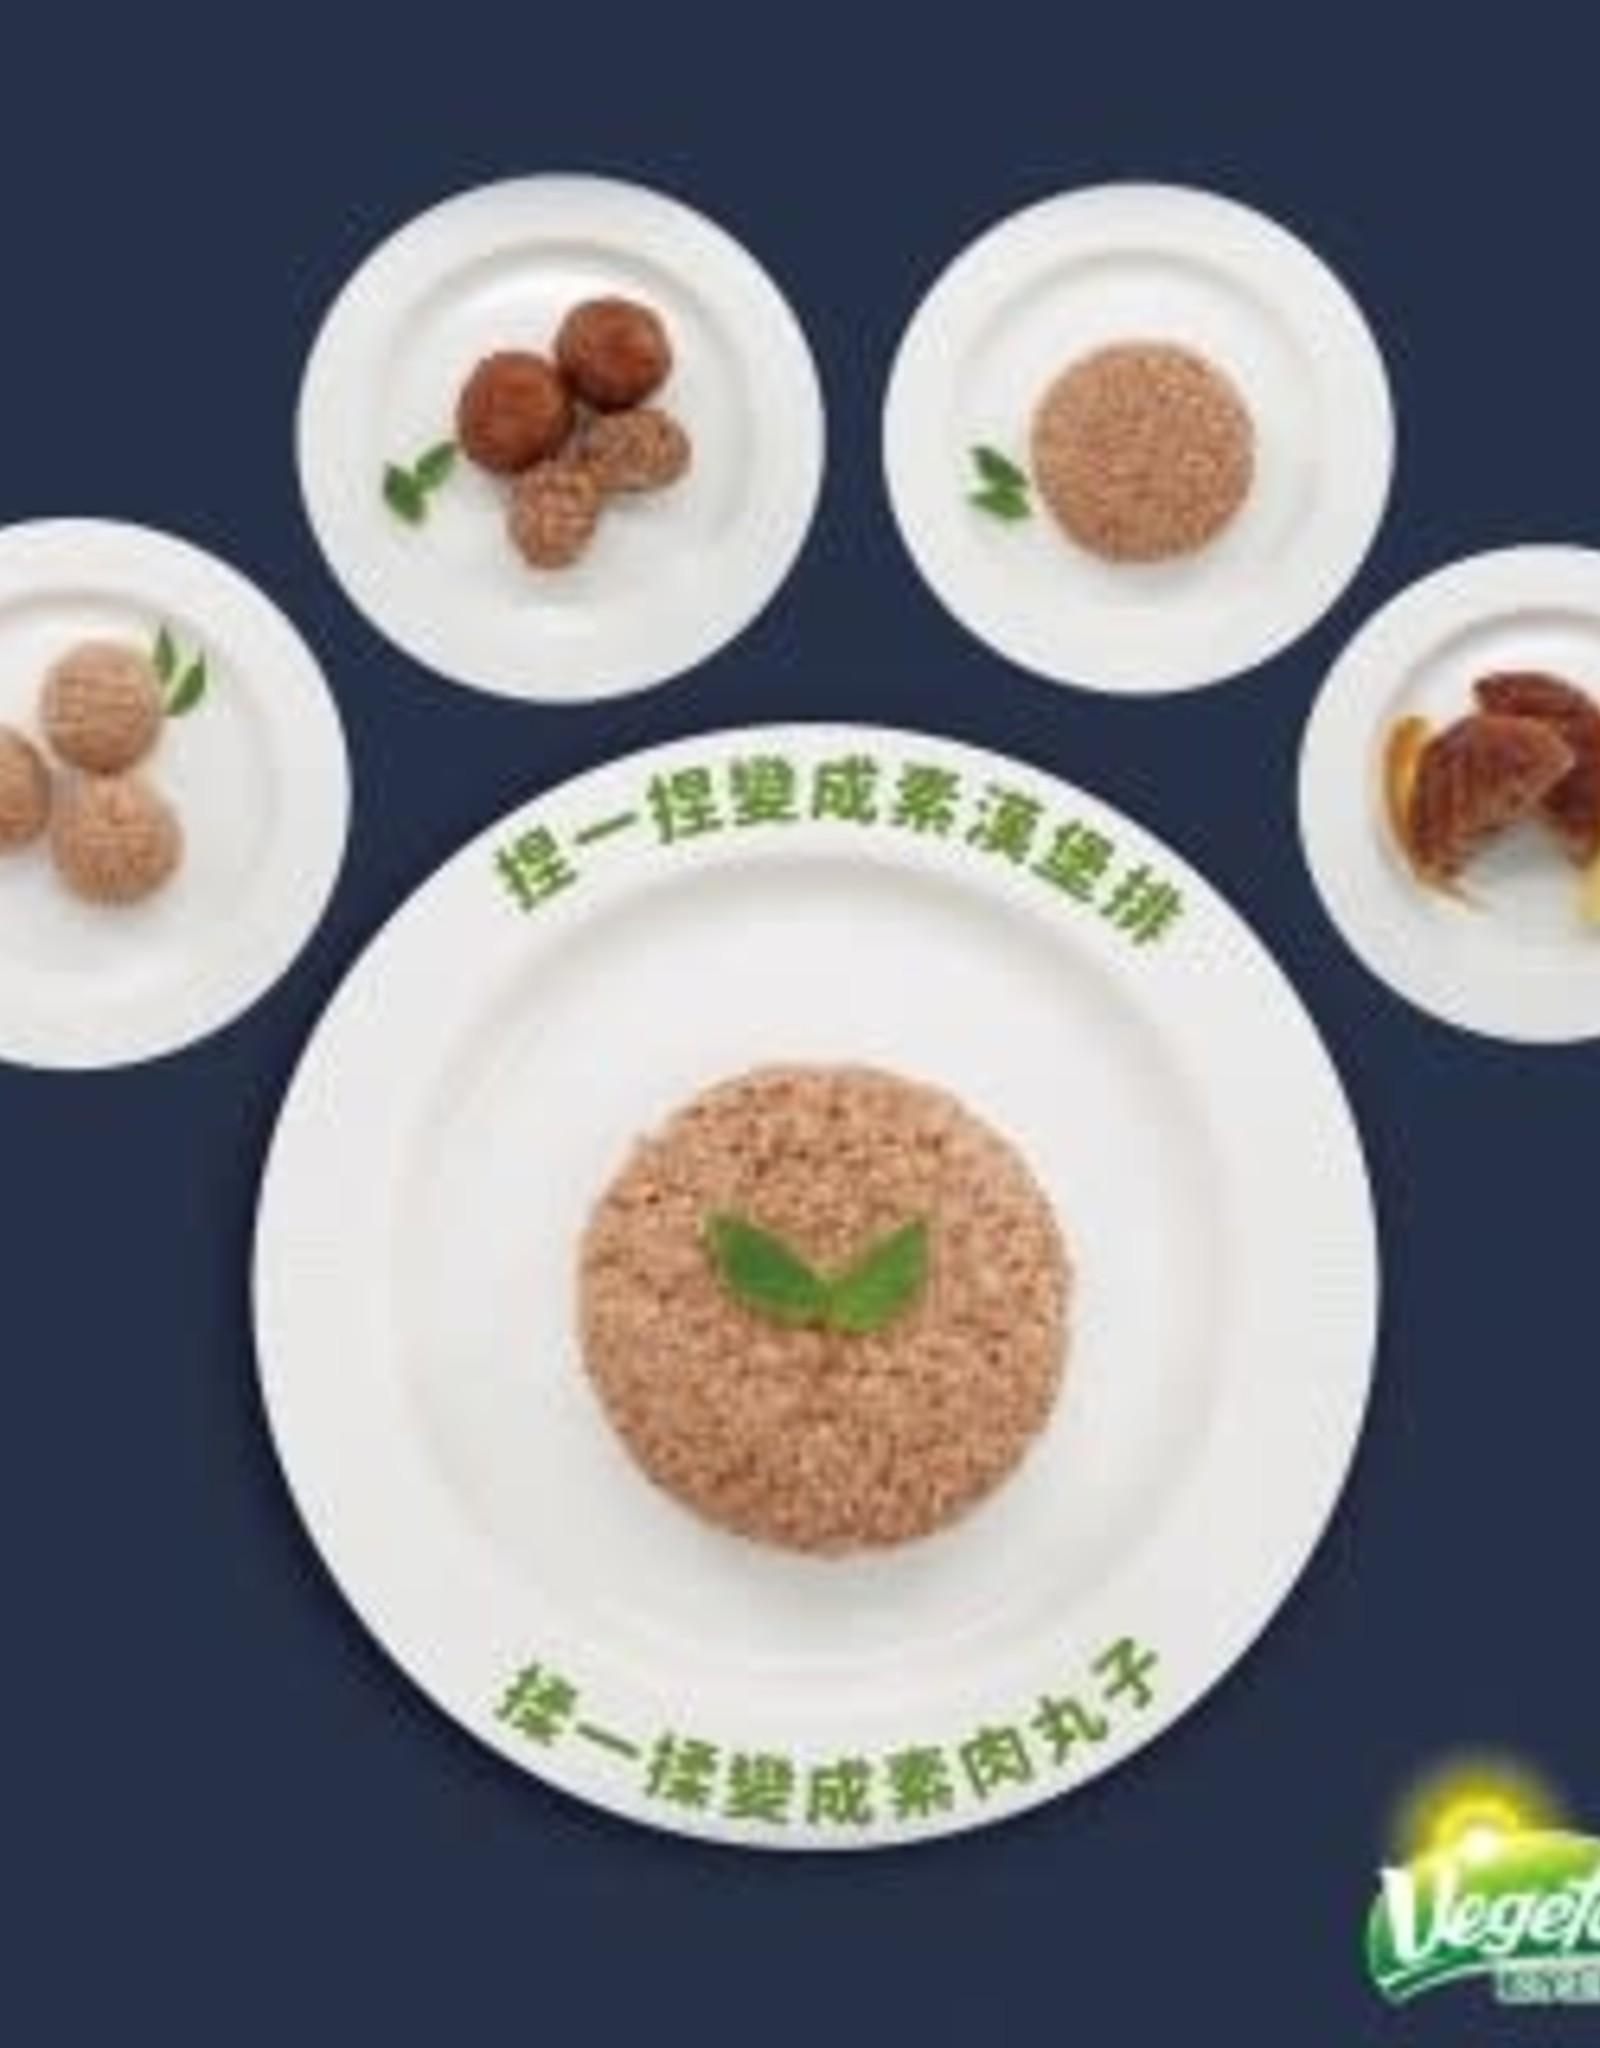 Vegefarm * 松珍 (VF) Vege Meat Free Mince*(松珍) 素絞肉